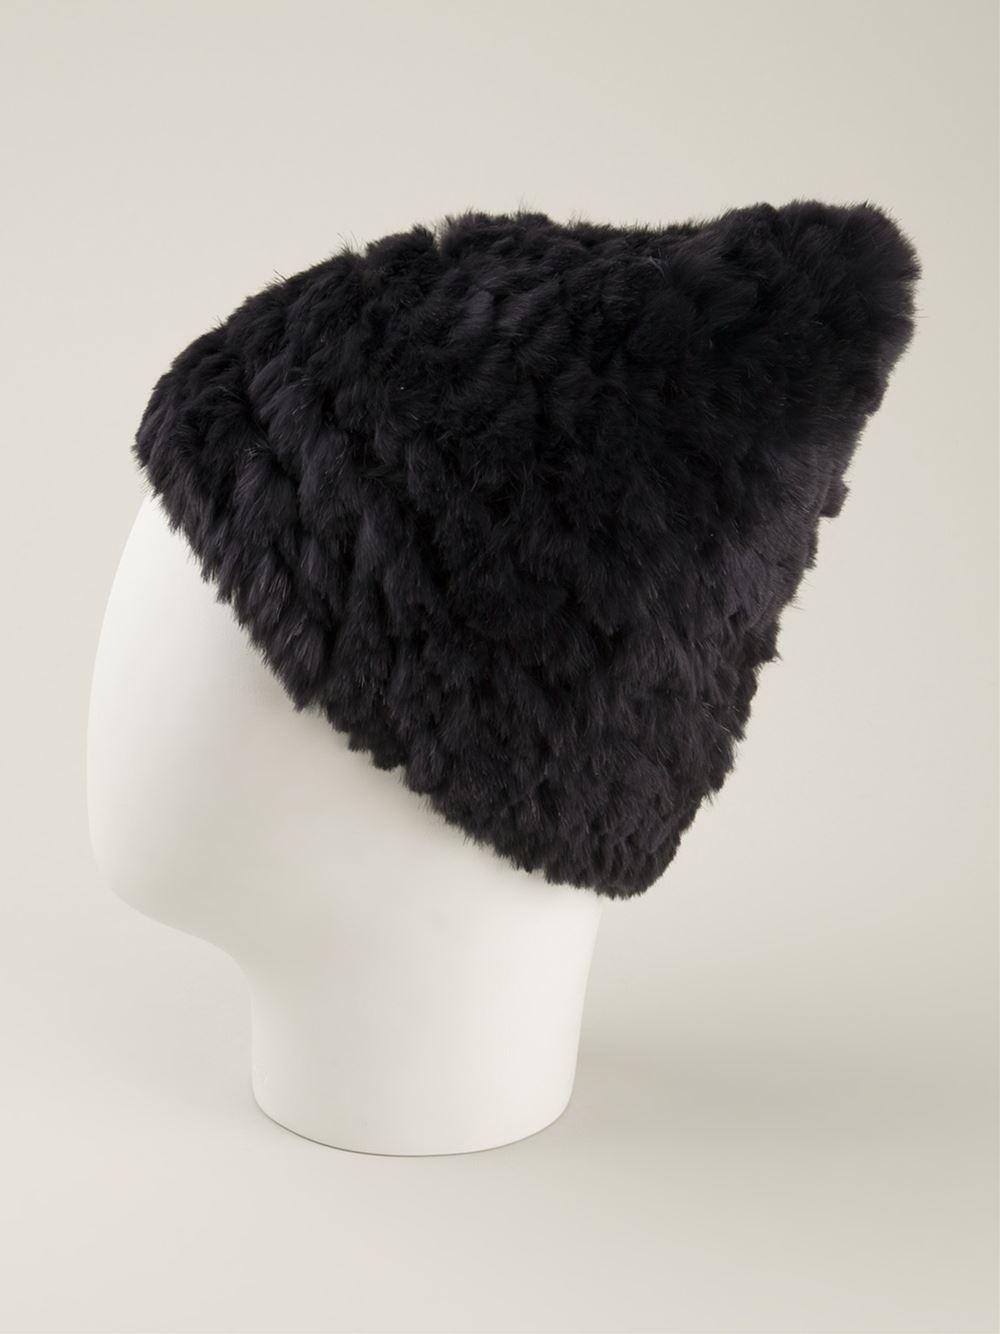 e5de872b5265 Lyst - Meteo by Yves Salomon Rabbit Fur Beanie in Black